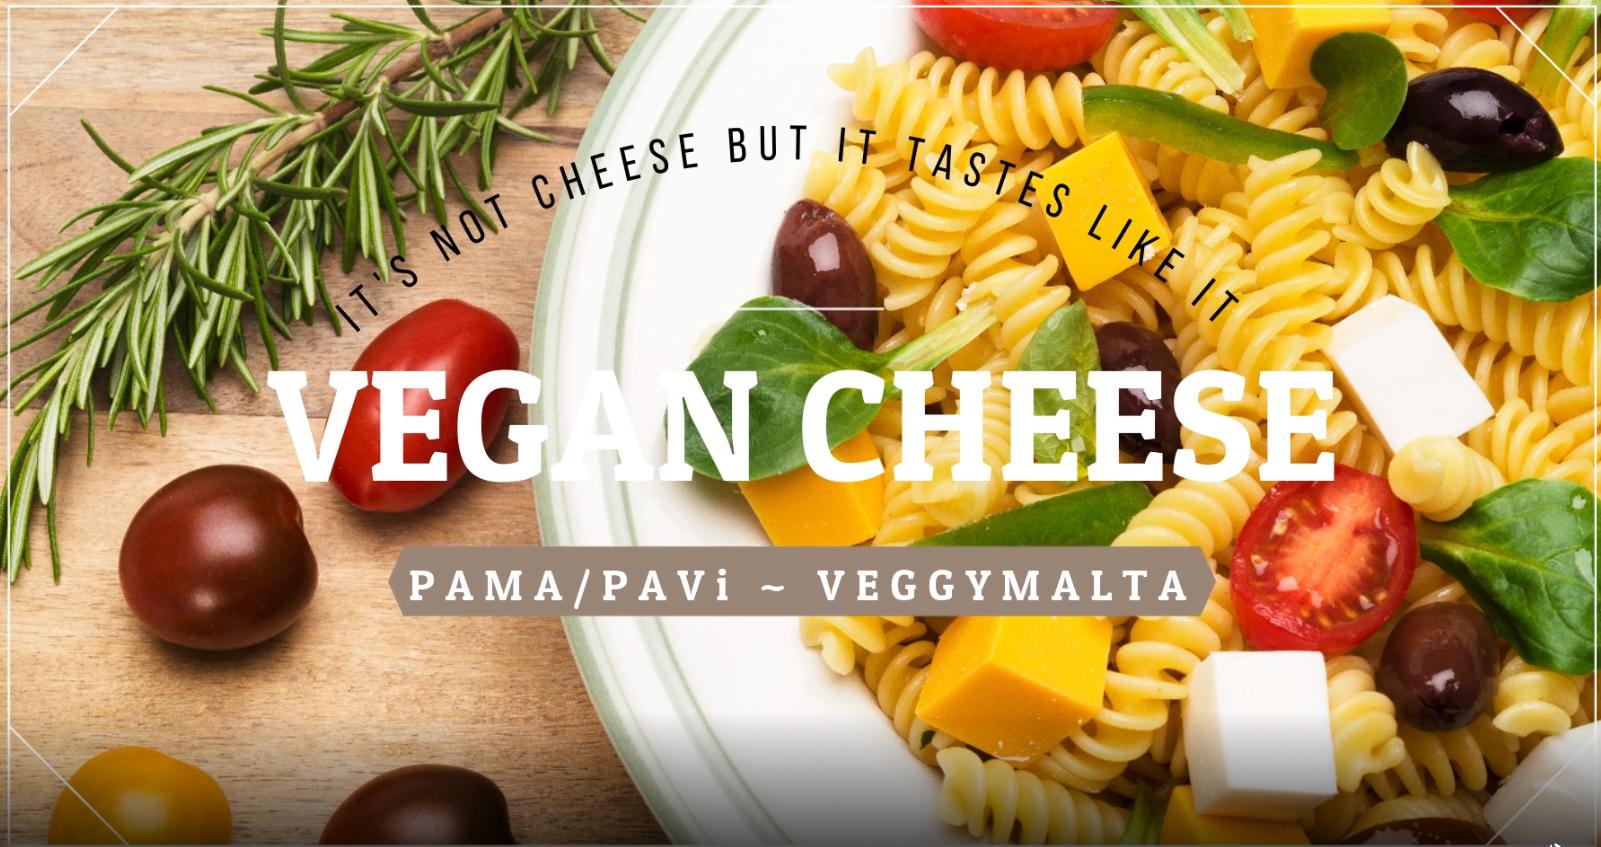 vegan cheeses malta